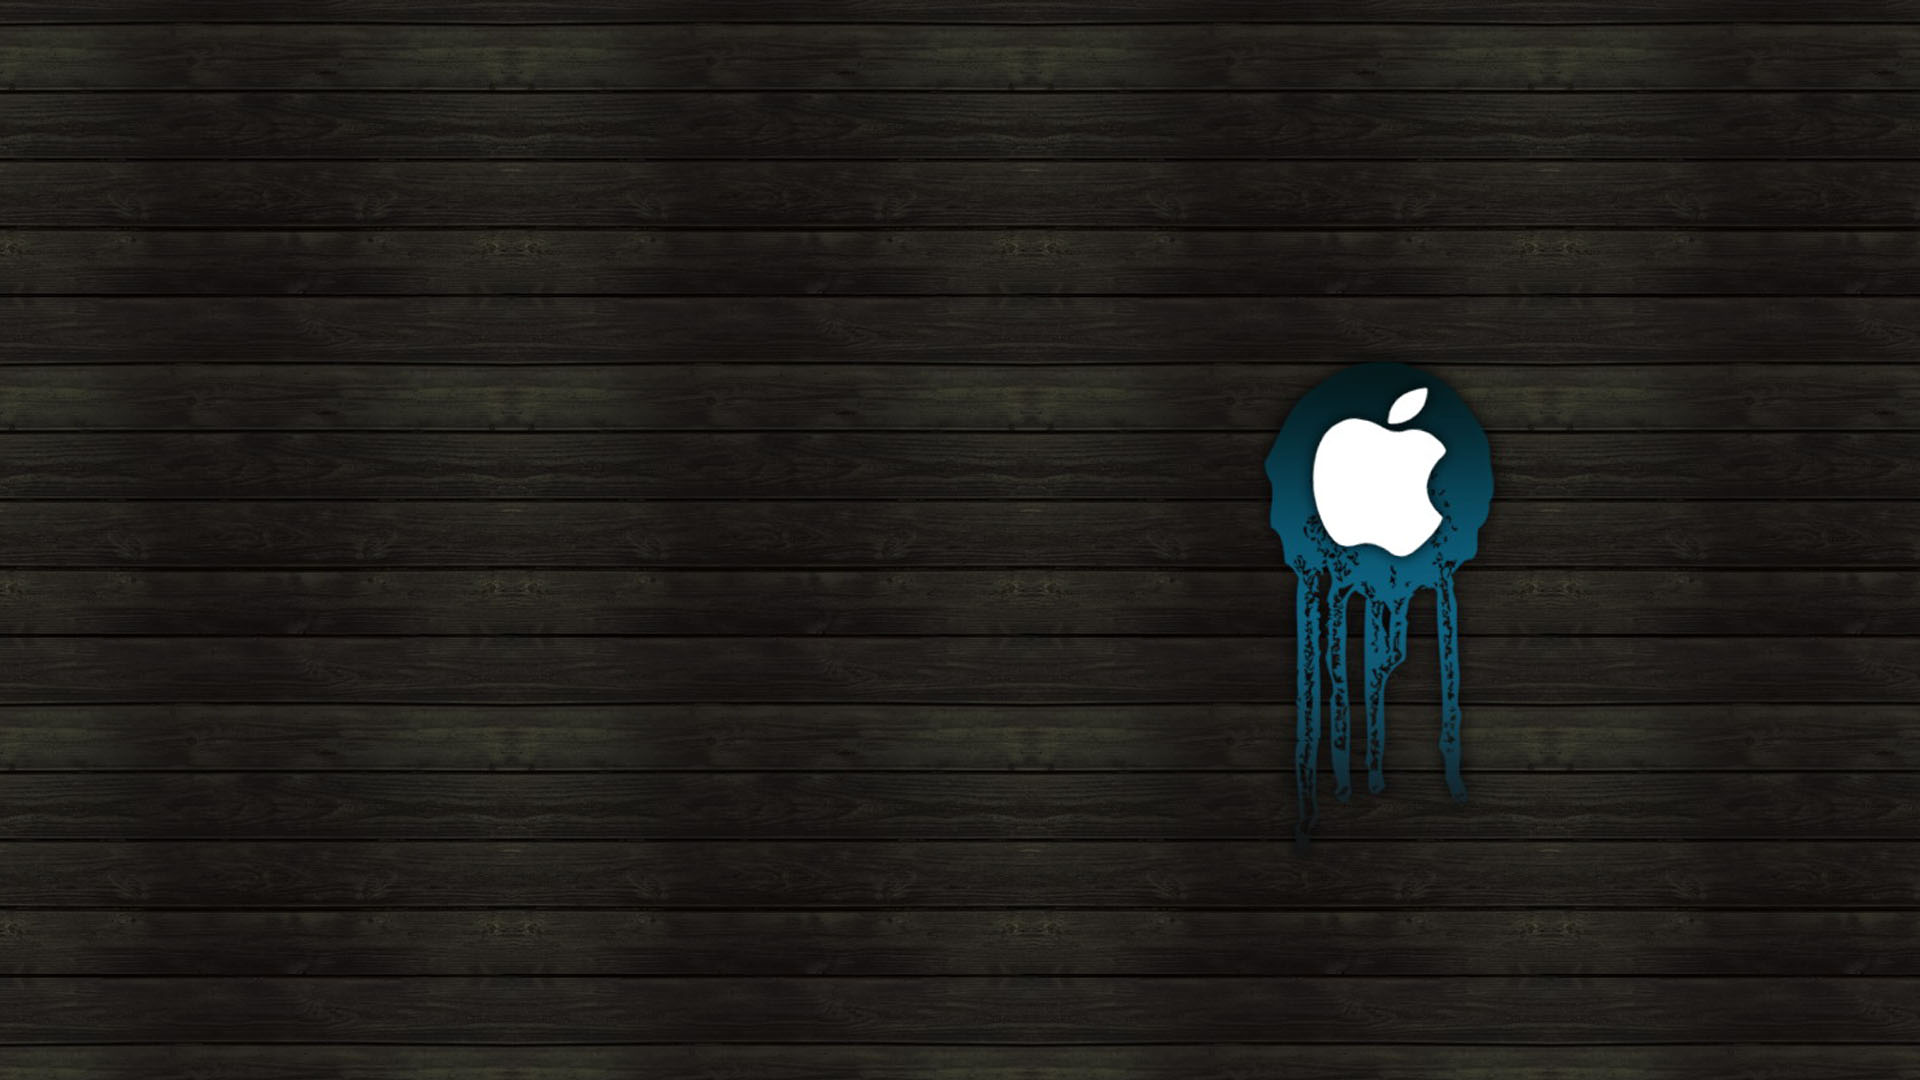 macbook wallpapers desktop wallpaper background mac visually 1920x1080